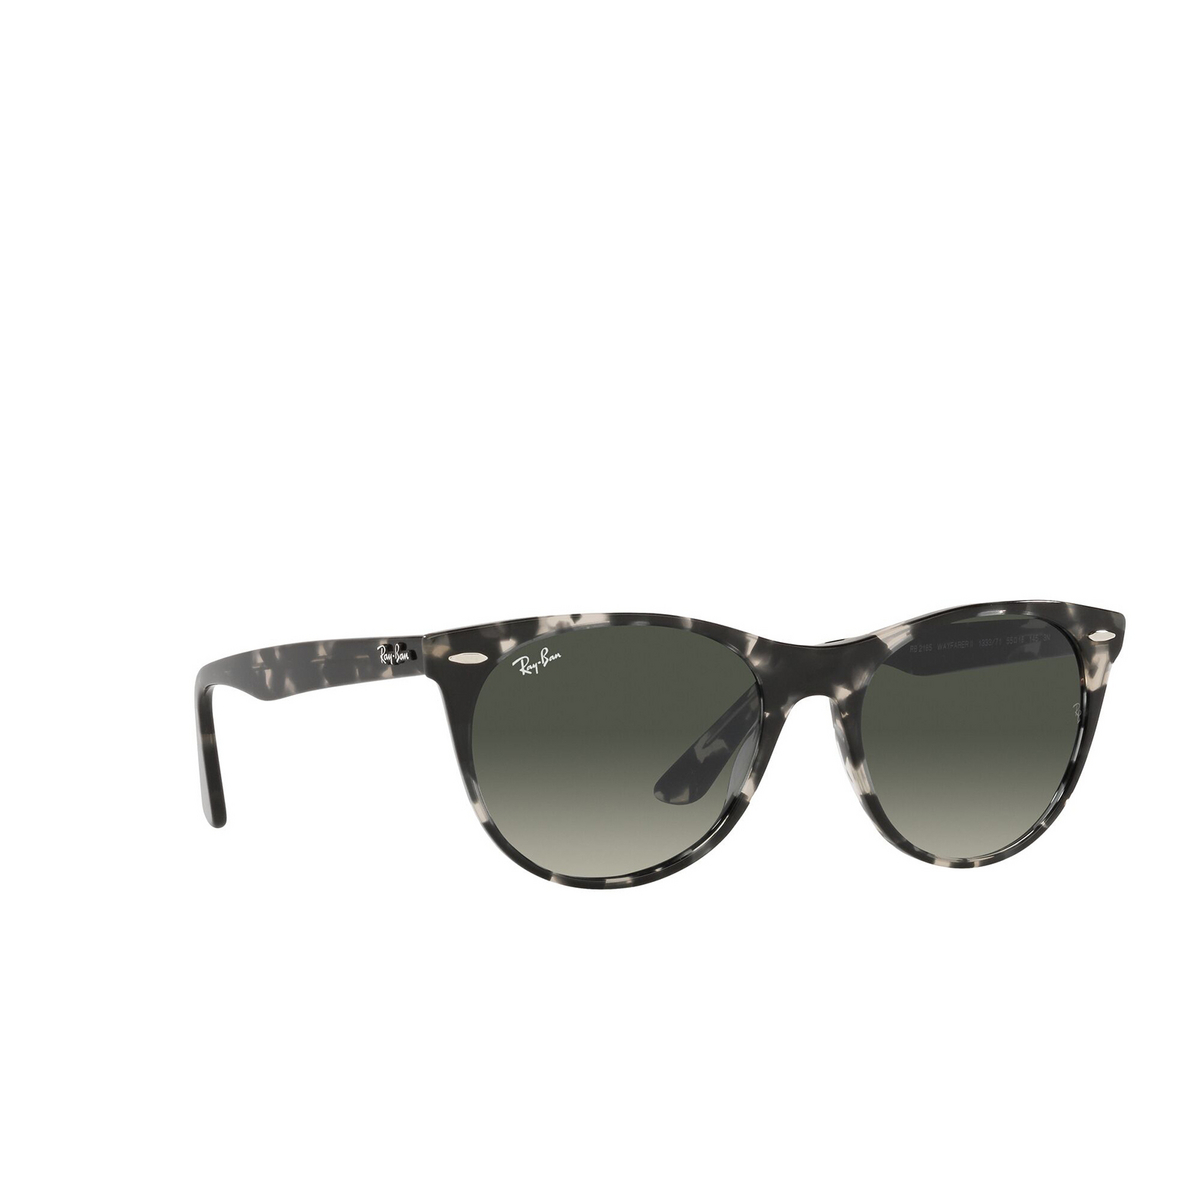 Ray-Ban® Round Sunglasses: Wayfarer Ii RB2185 color Gray Havana 133371 - three-quarters view.